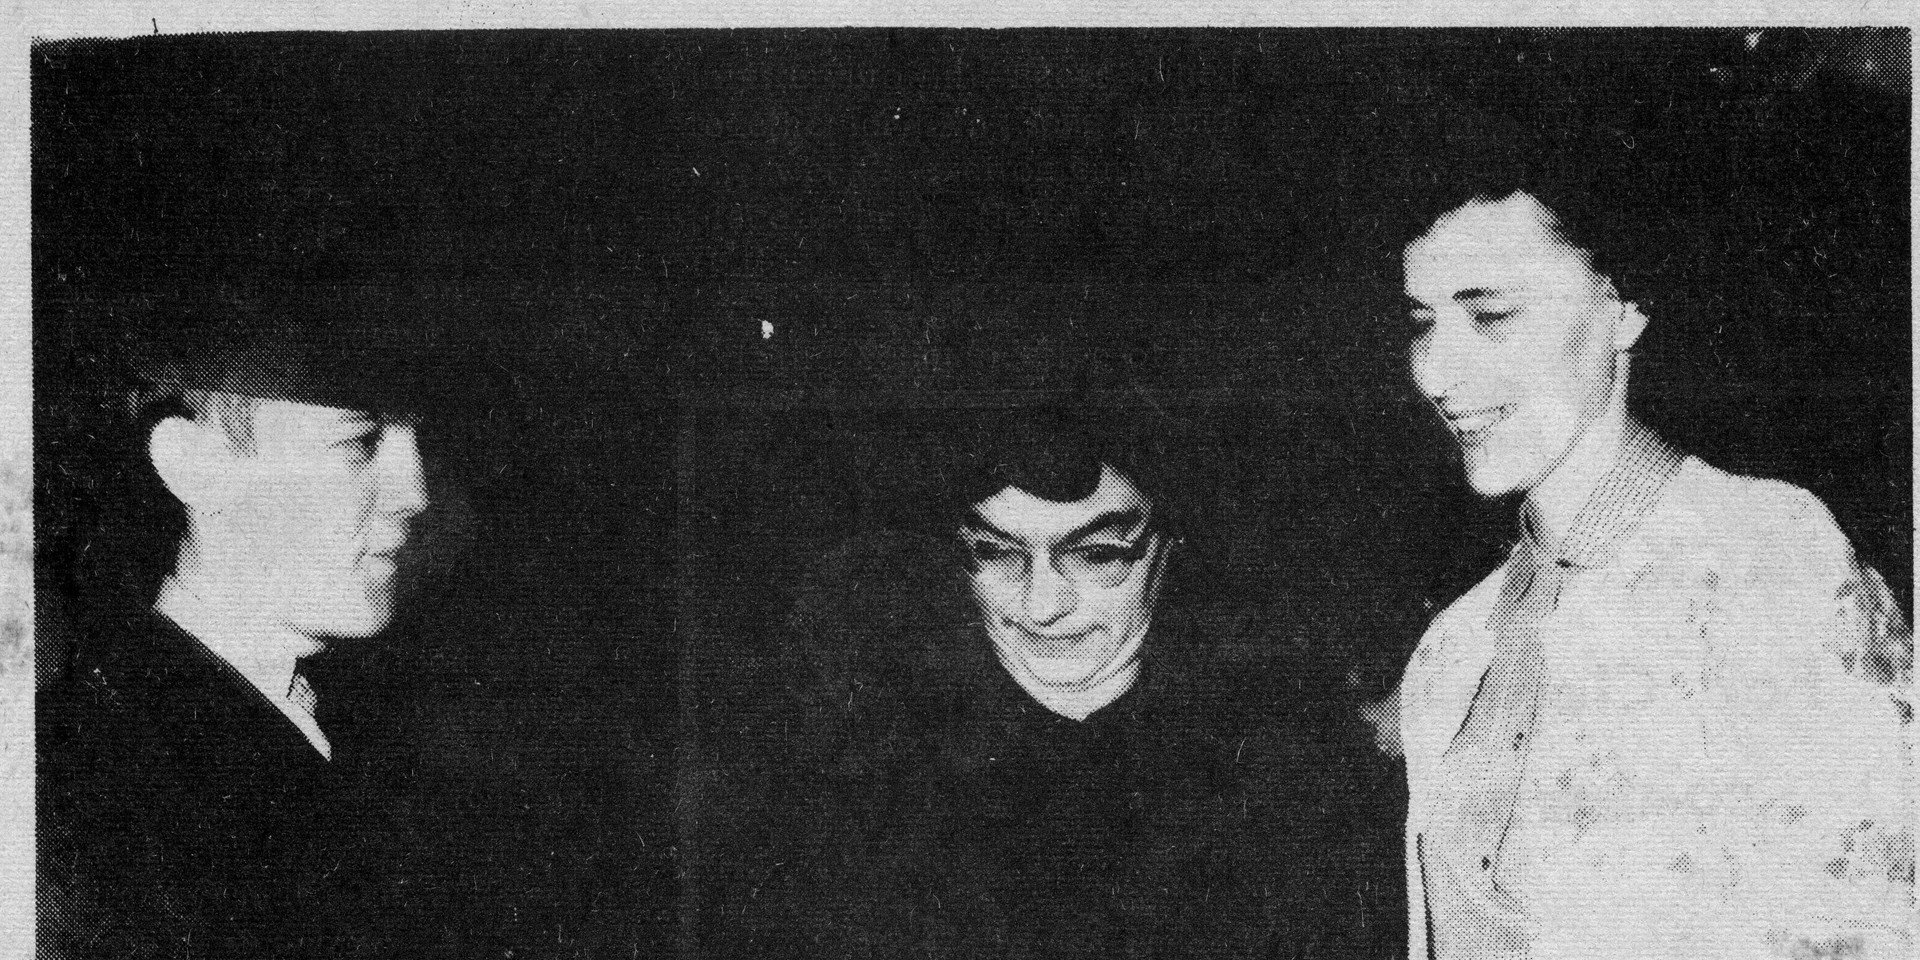 1. Surrey Herald 11 June 1964 - no capti